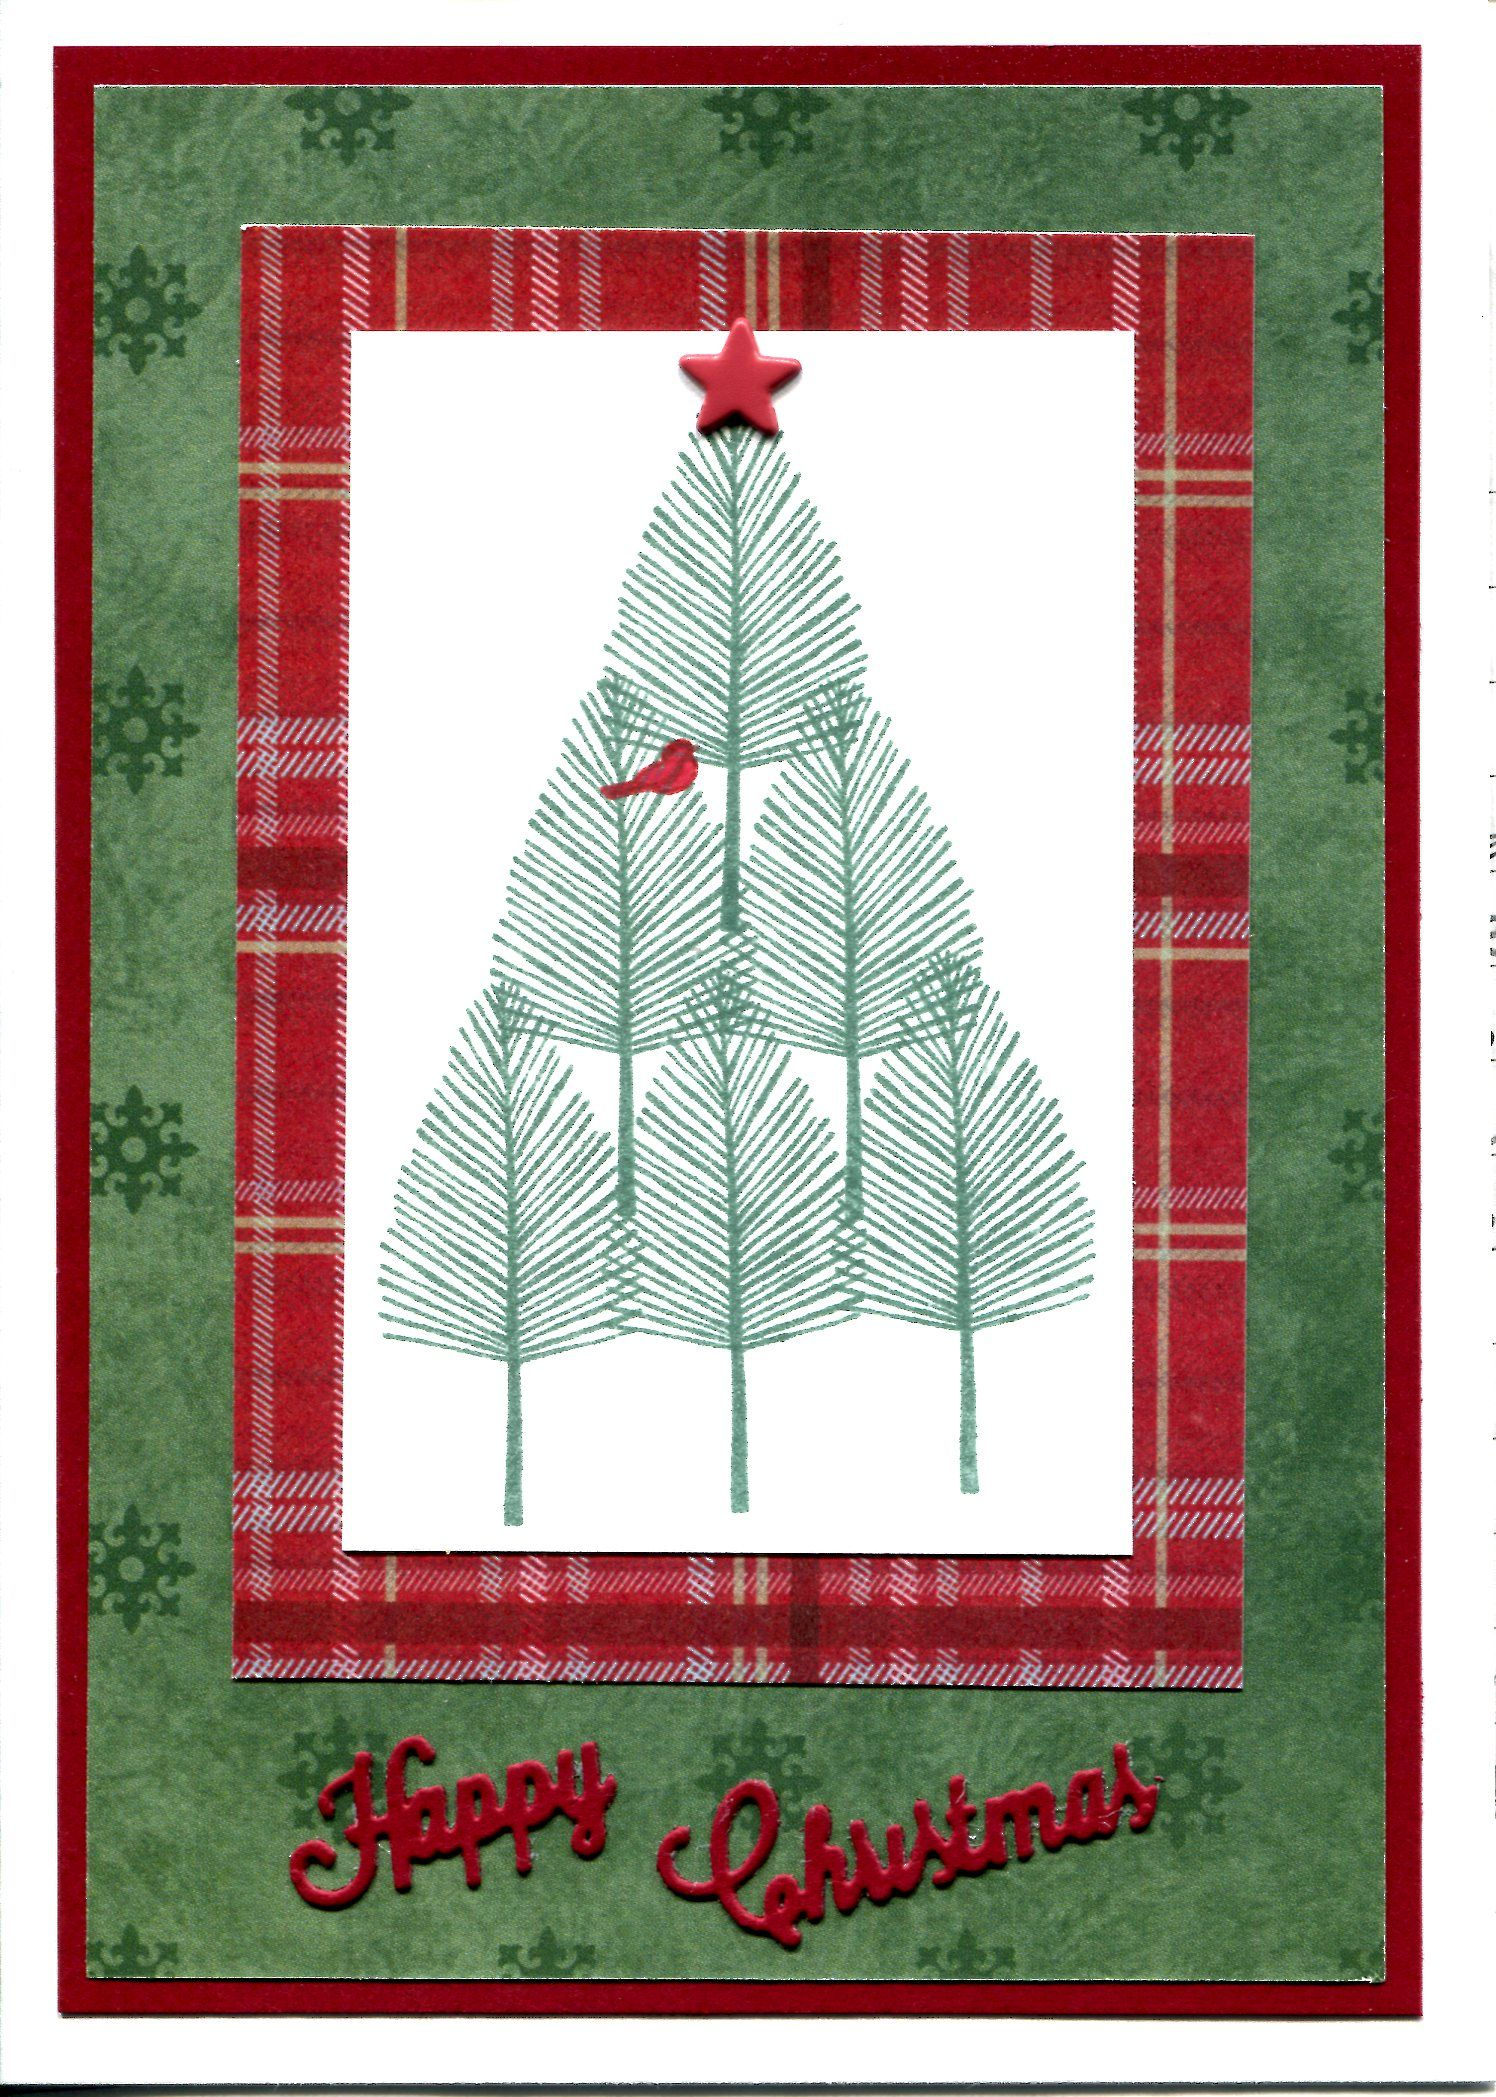 Handmade Christmas Card. My version of an idea seen on Pinterest ...